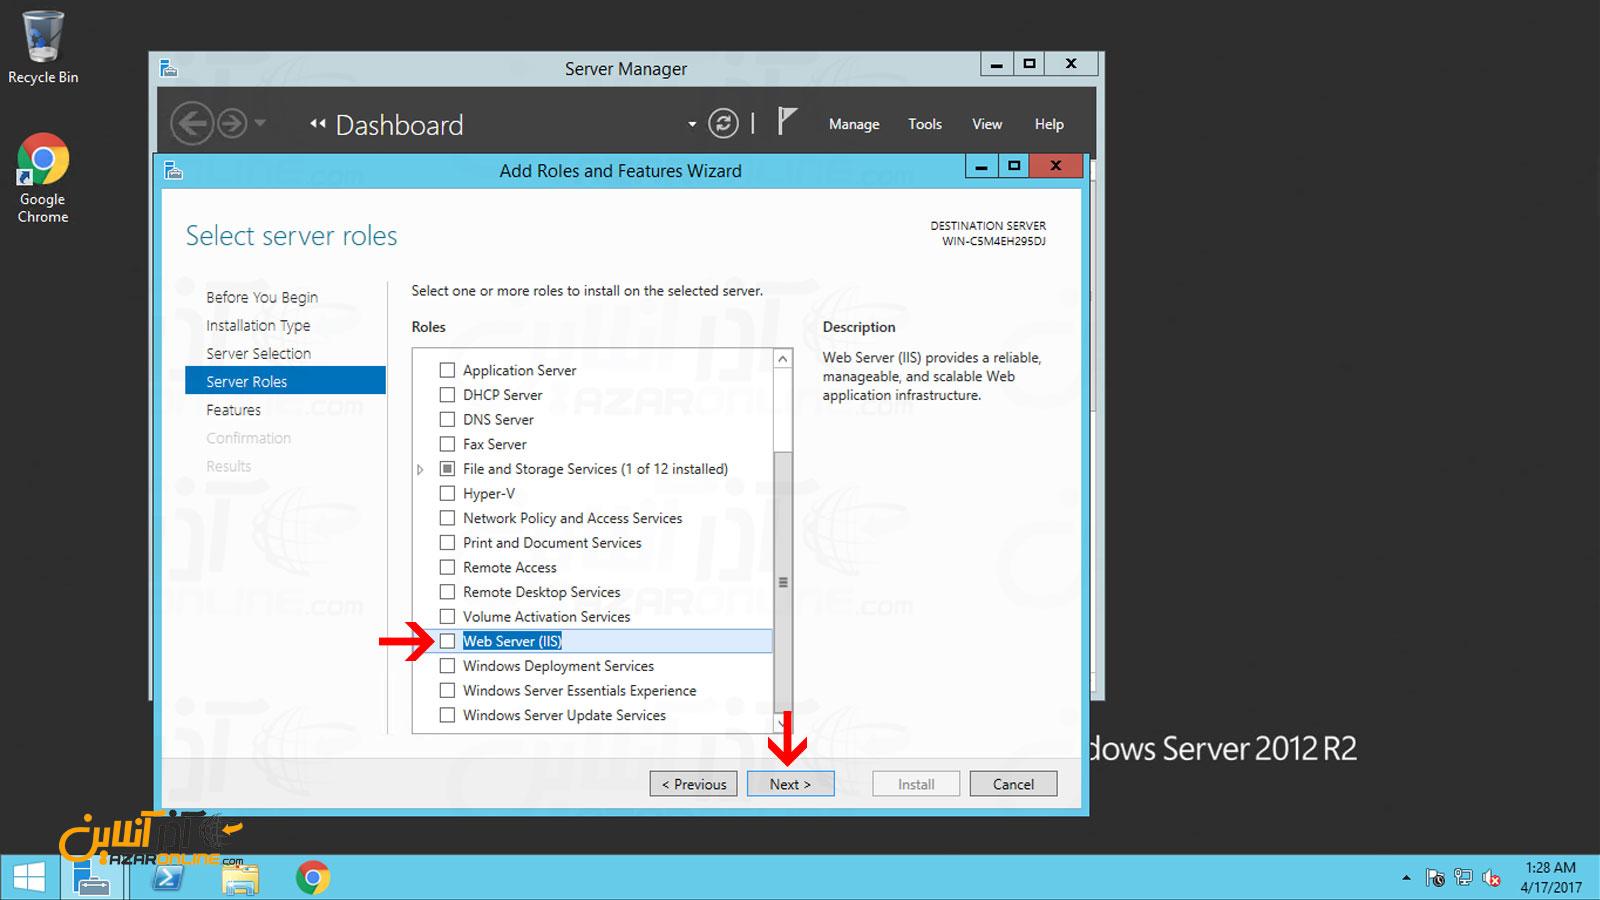 انتخاب رول Web Server